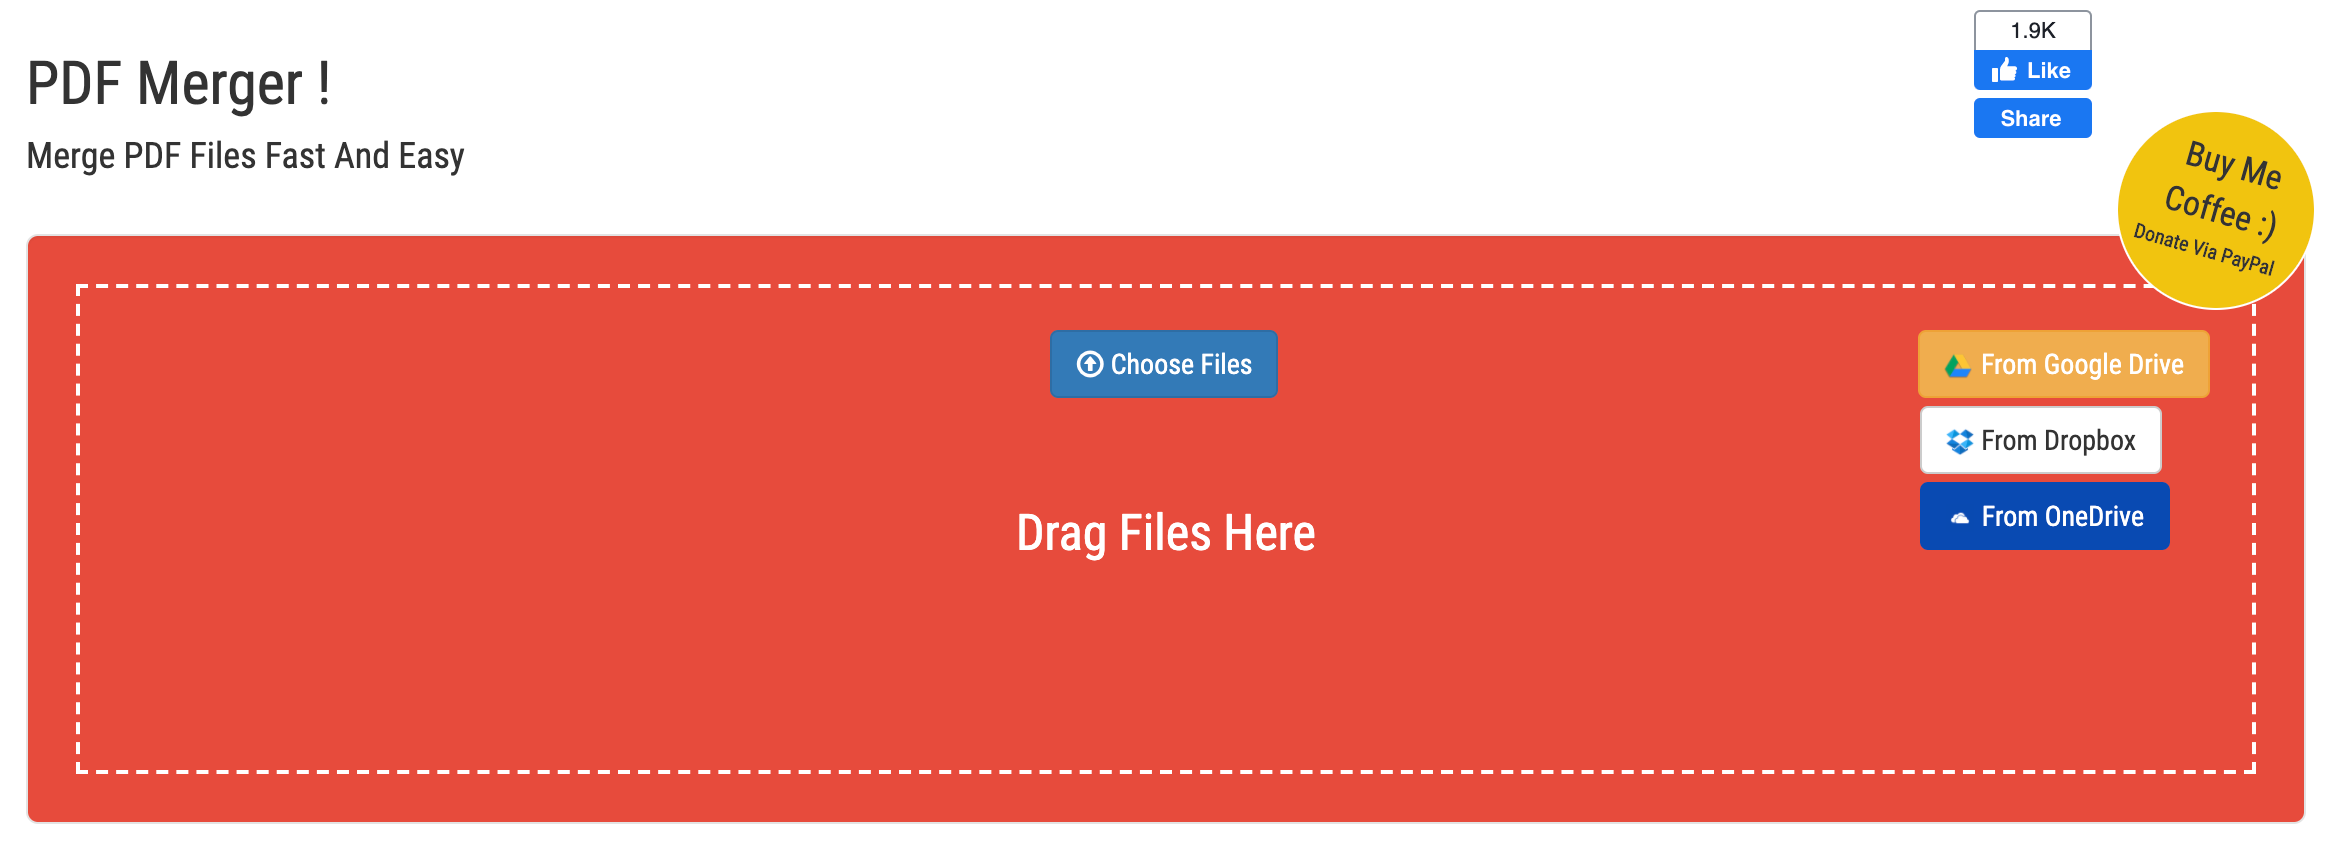 Select files, PDF Merge Files